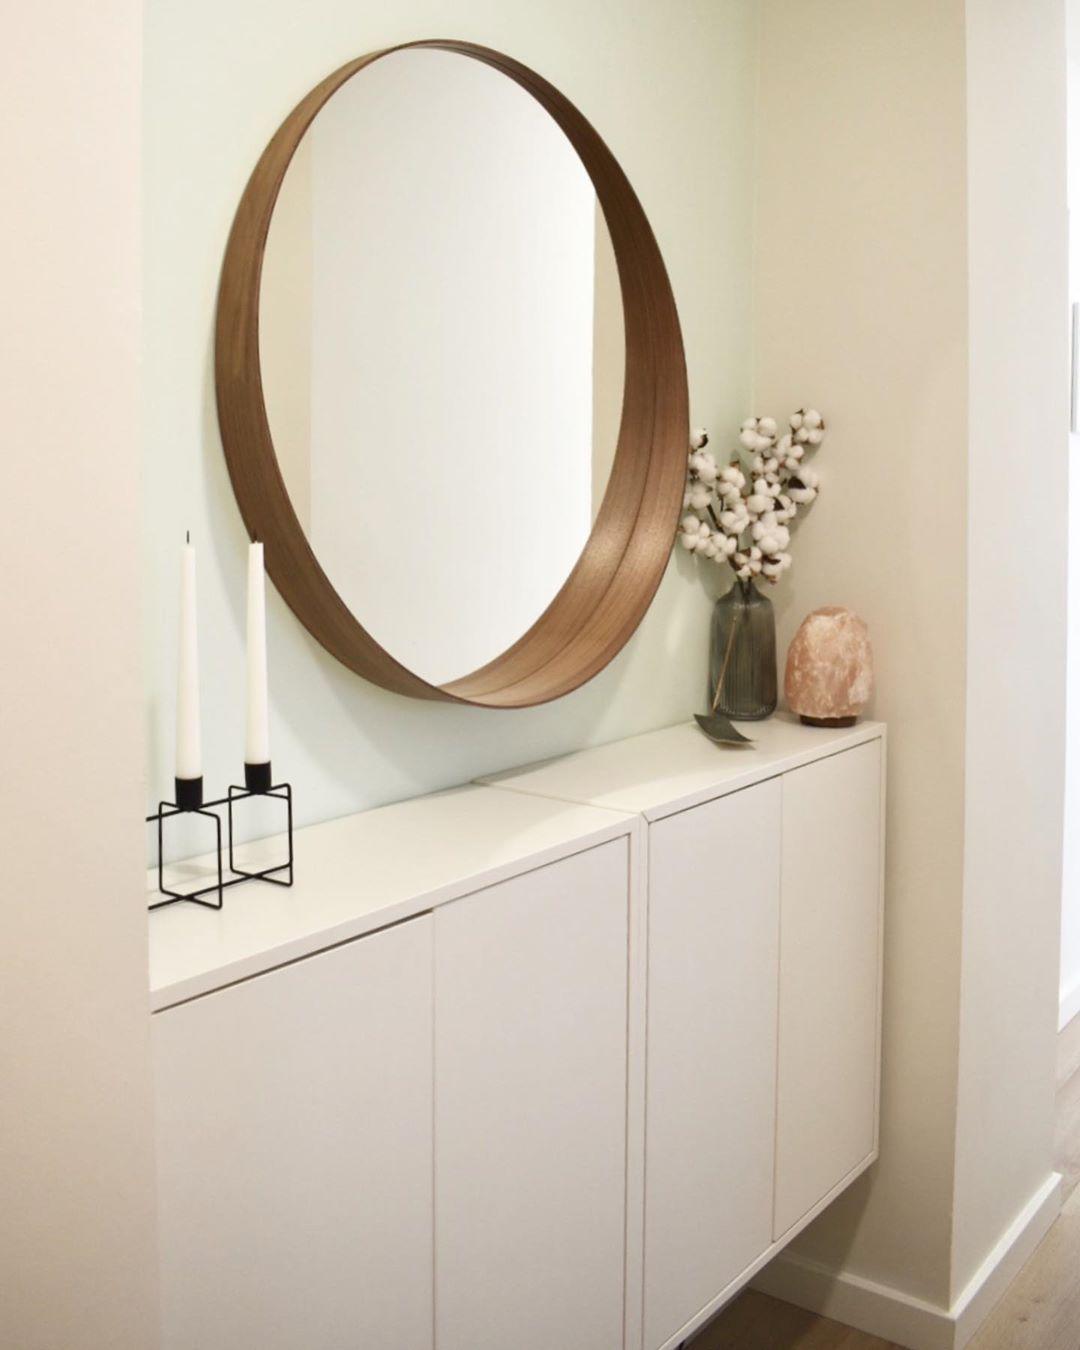 Pin de Sanda Milenkovic en Home | Espejos para baños, Ikea ...